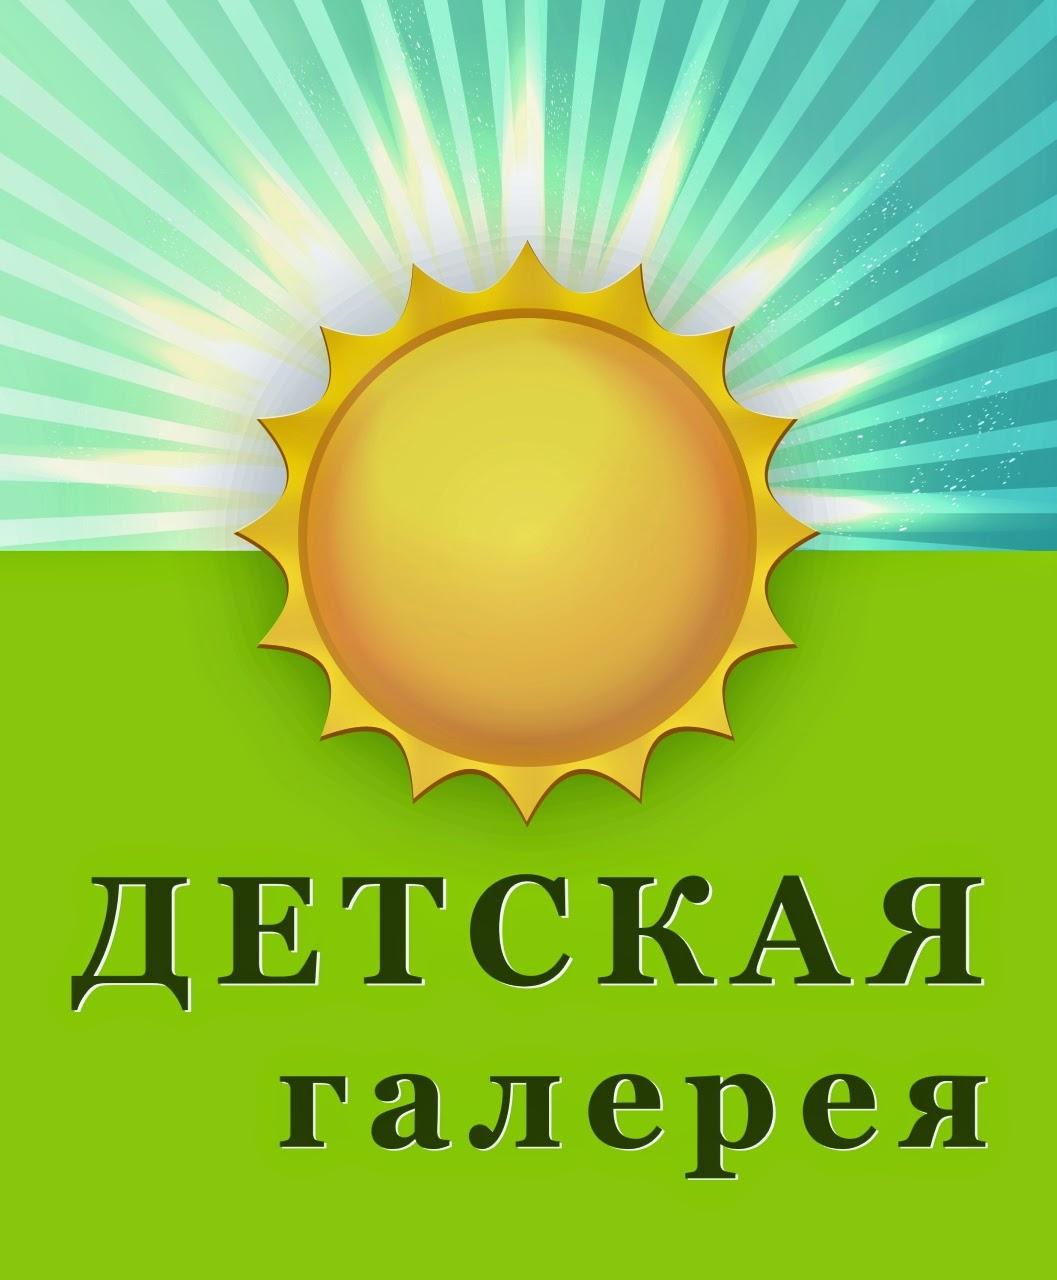 http://yellowchickens.blogspot.ru/2015/03/6.html